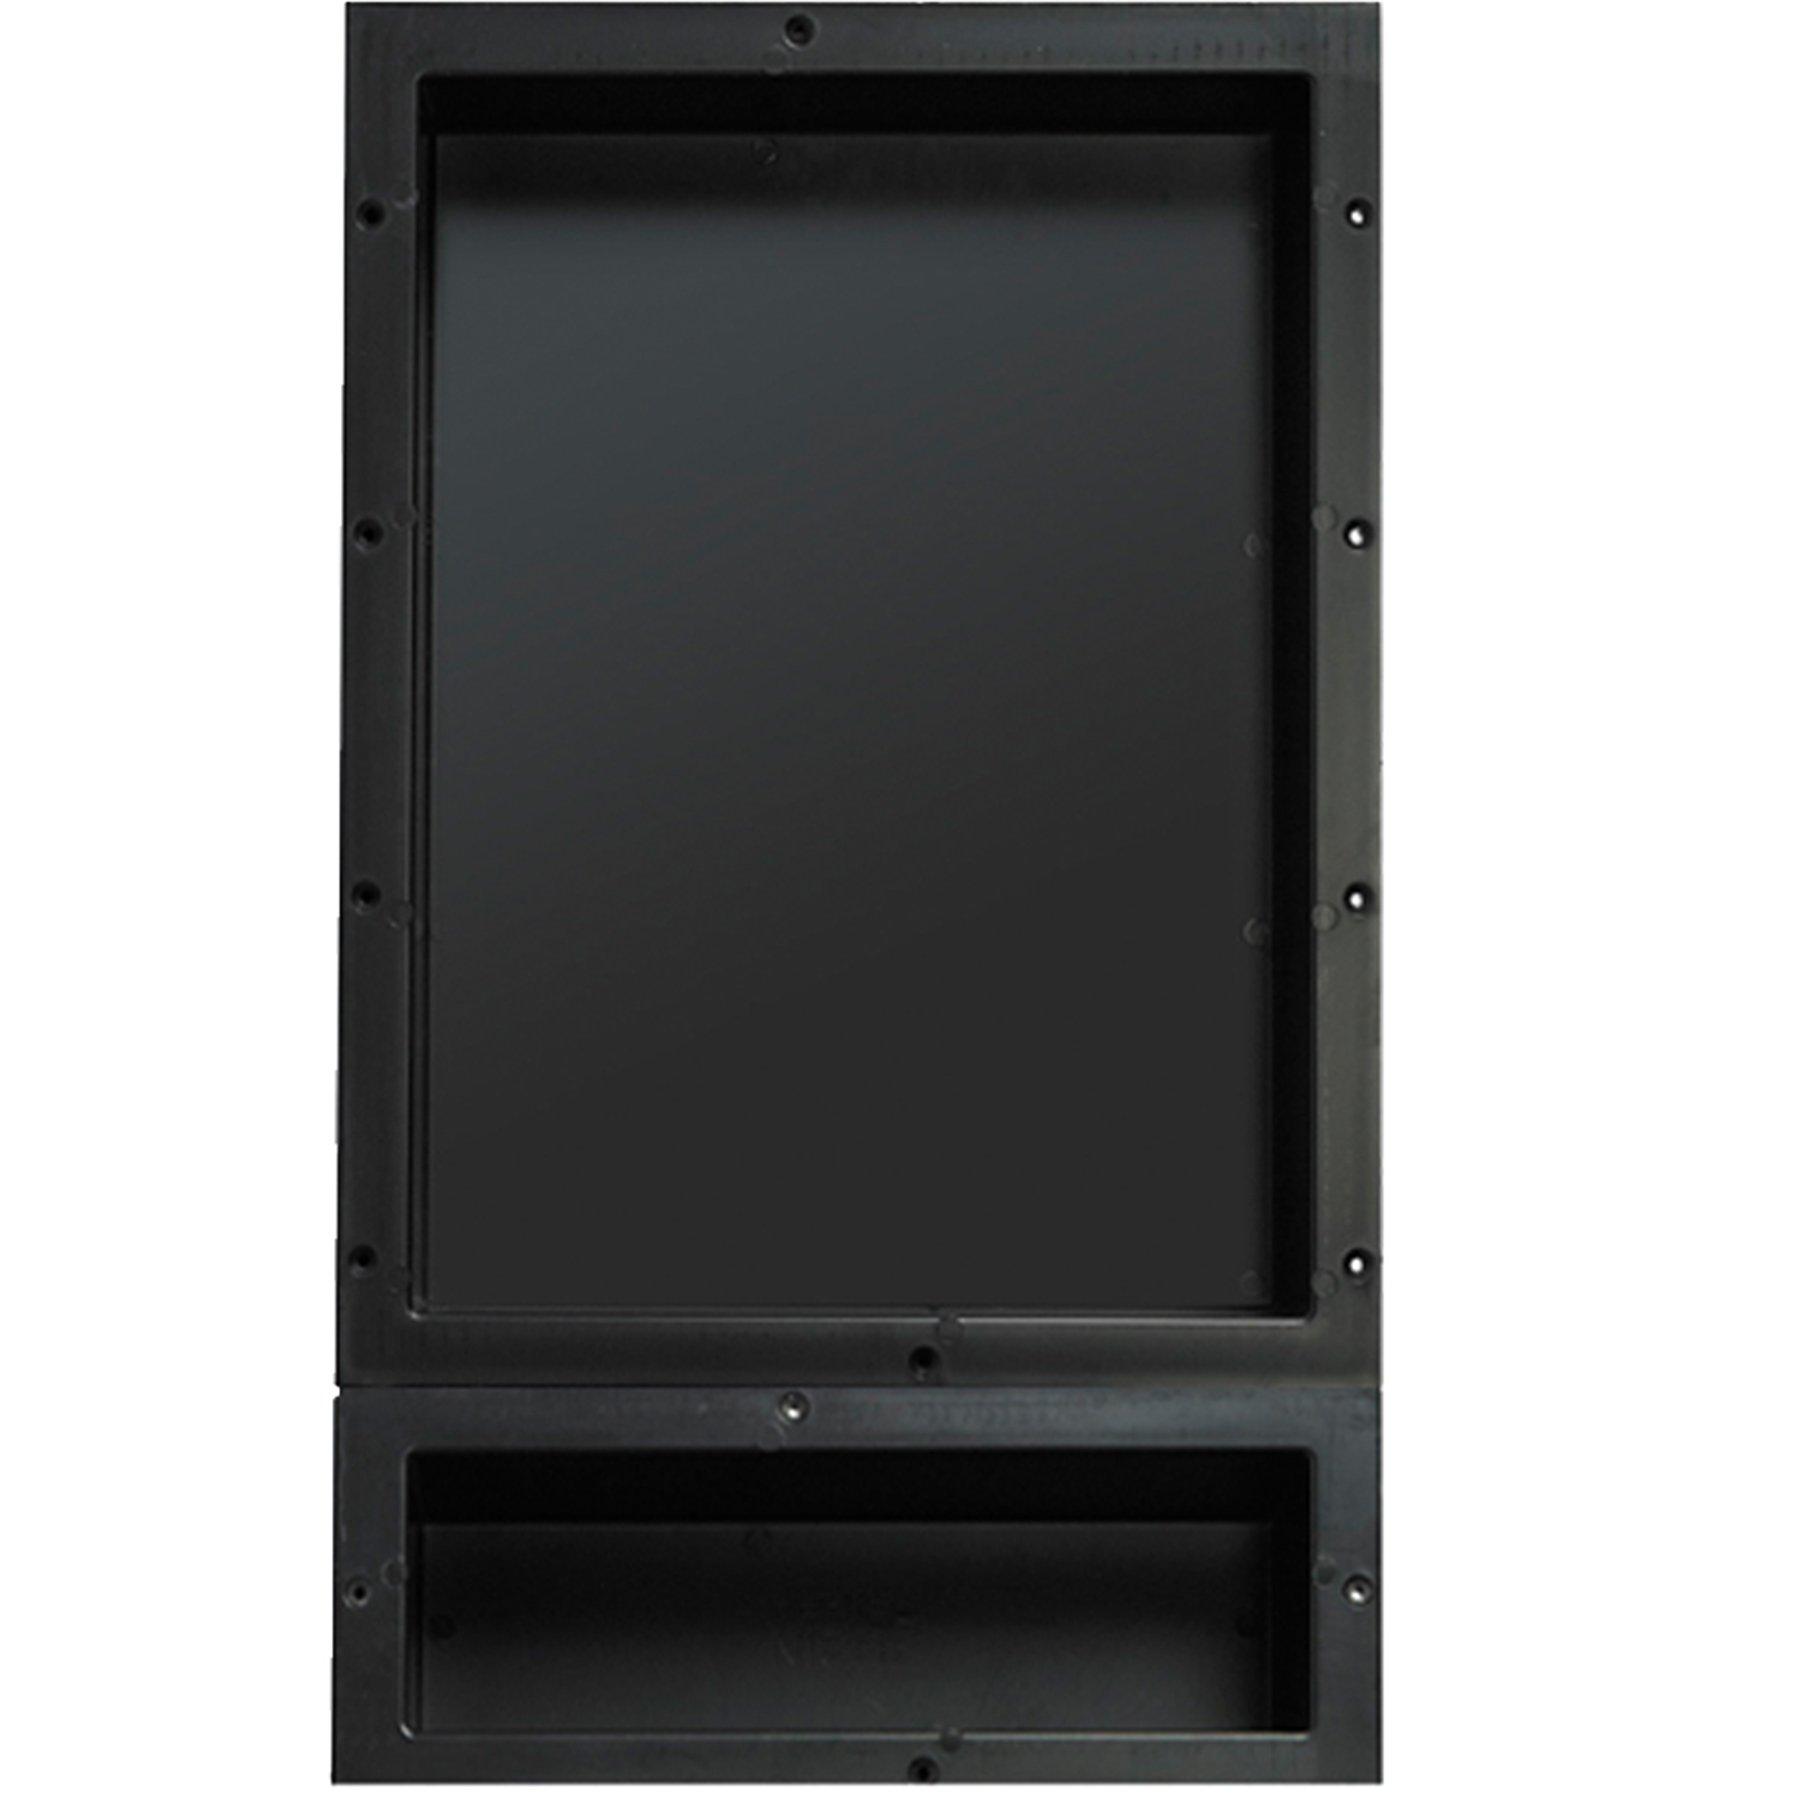 Tile Redi USA RND1620S-6 Niche Shower Niche, 16'' x 26'', Black